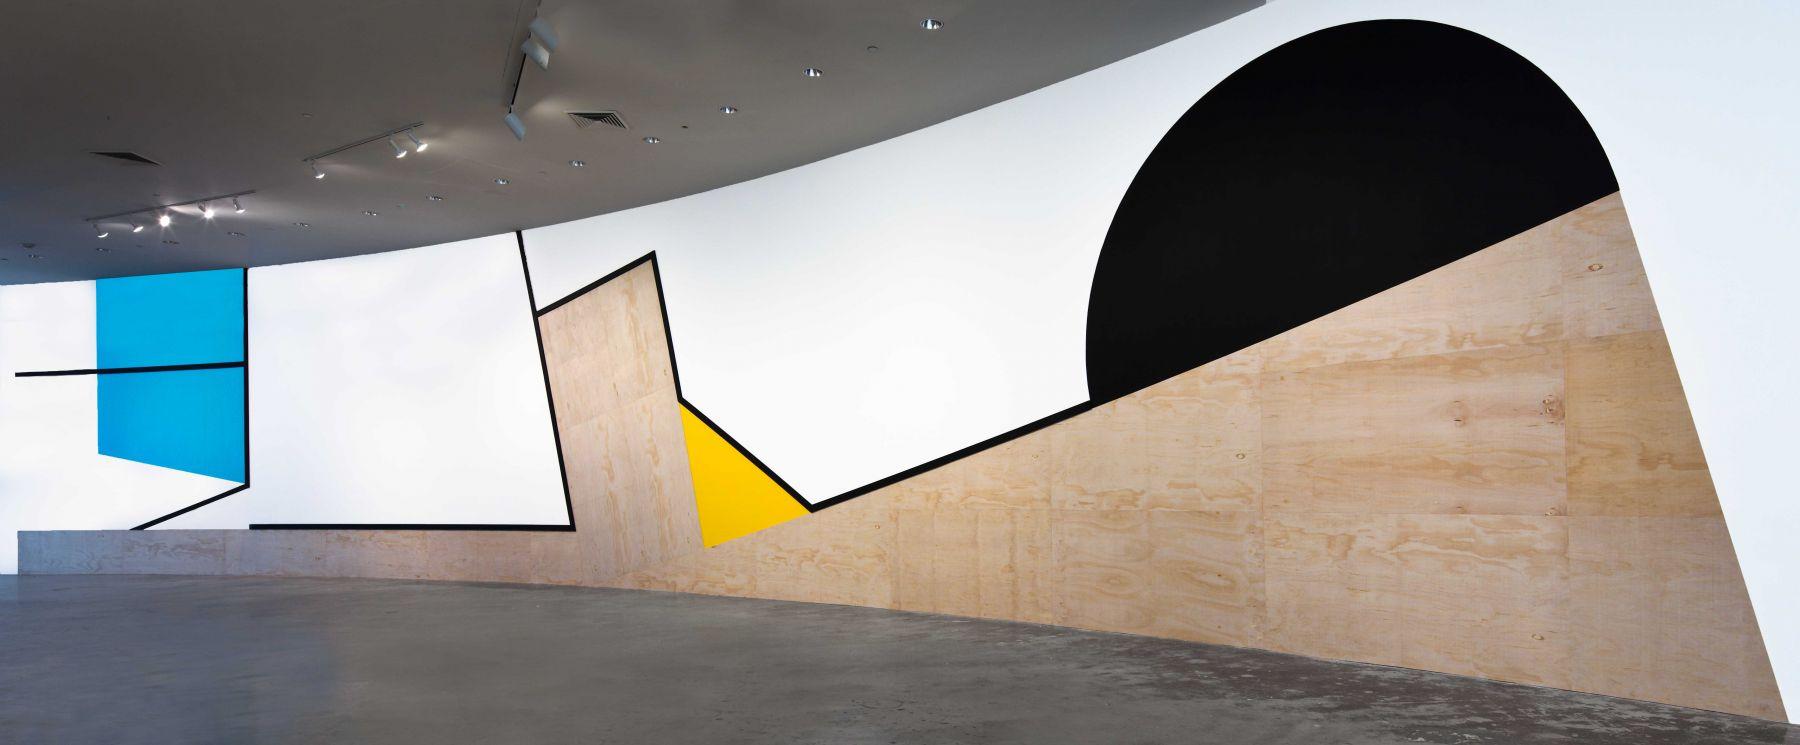 large abstract geometric artwork in a florida museum by serge alain nitegeka